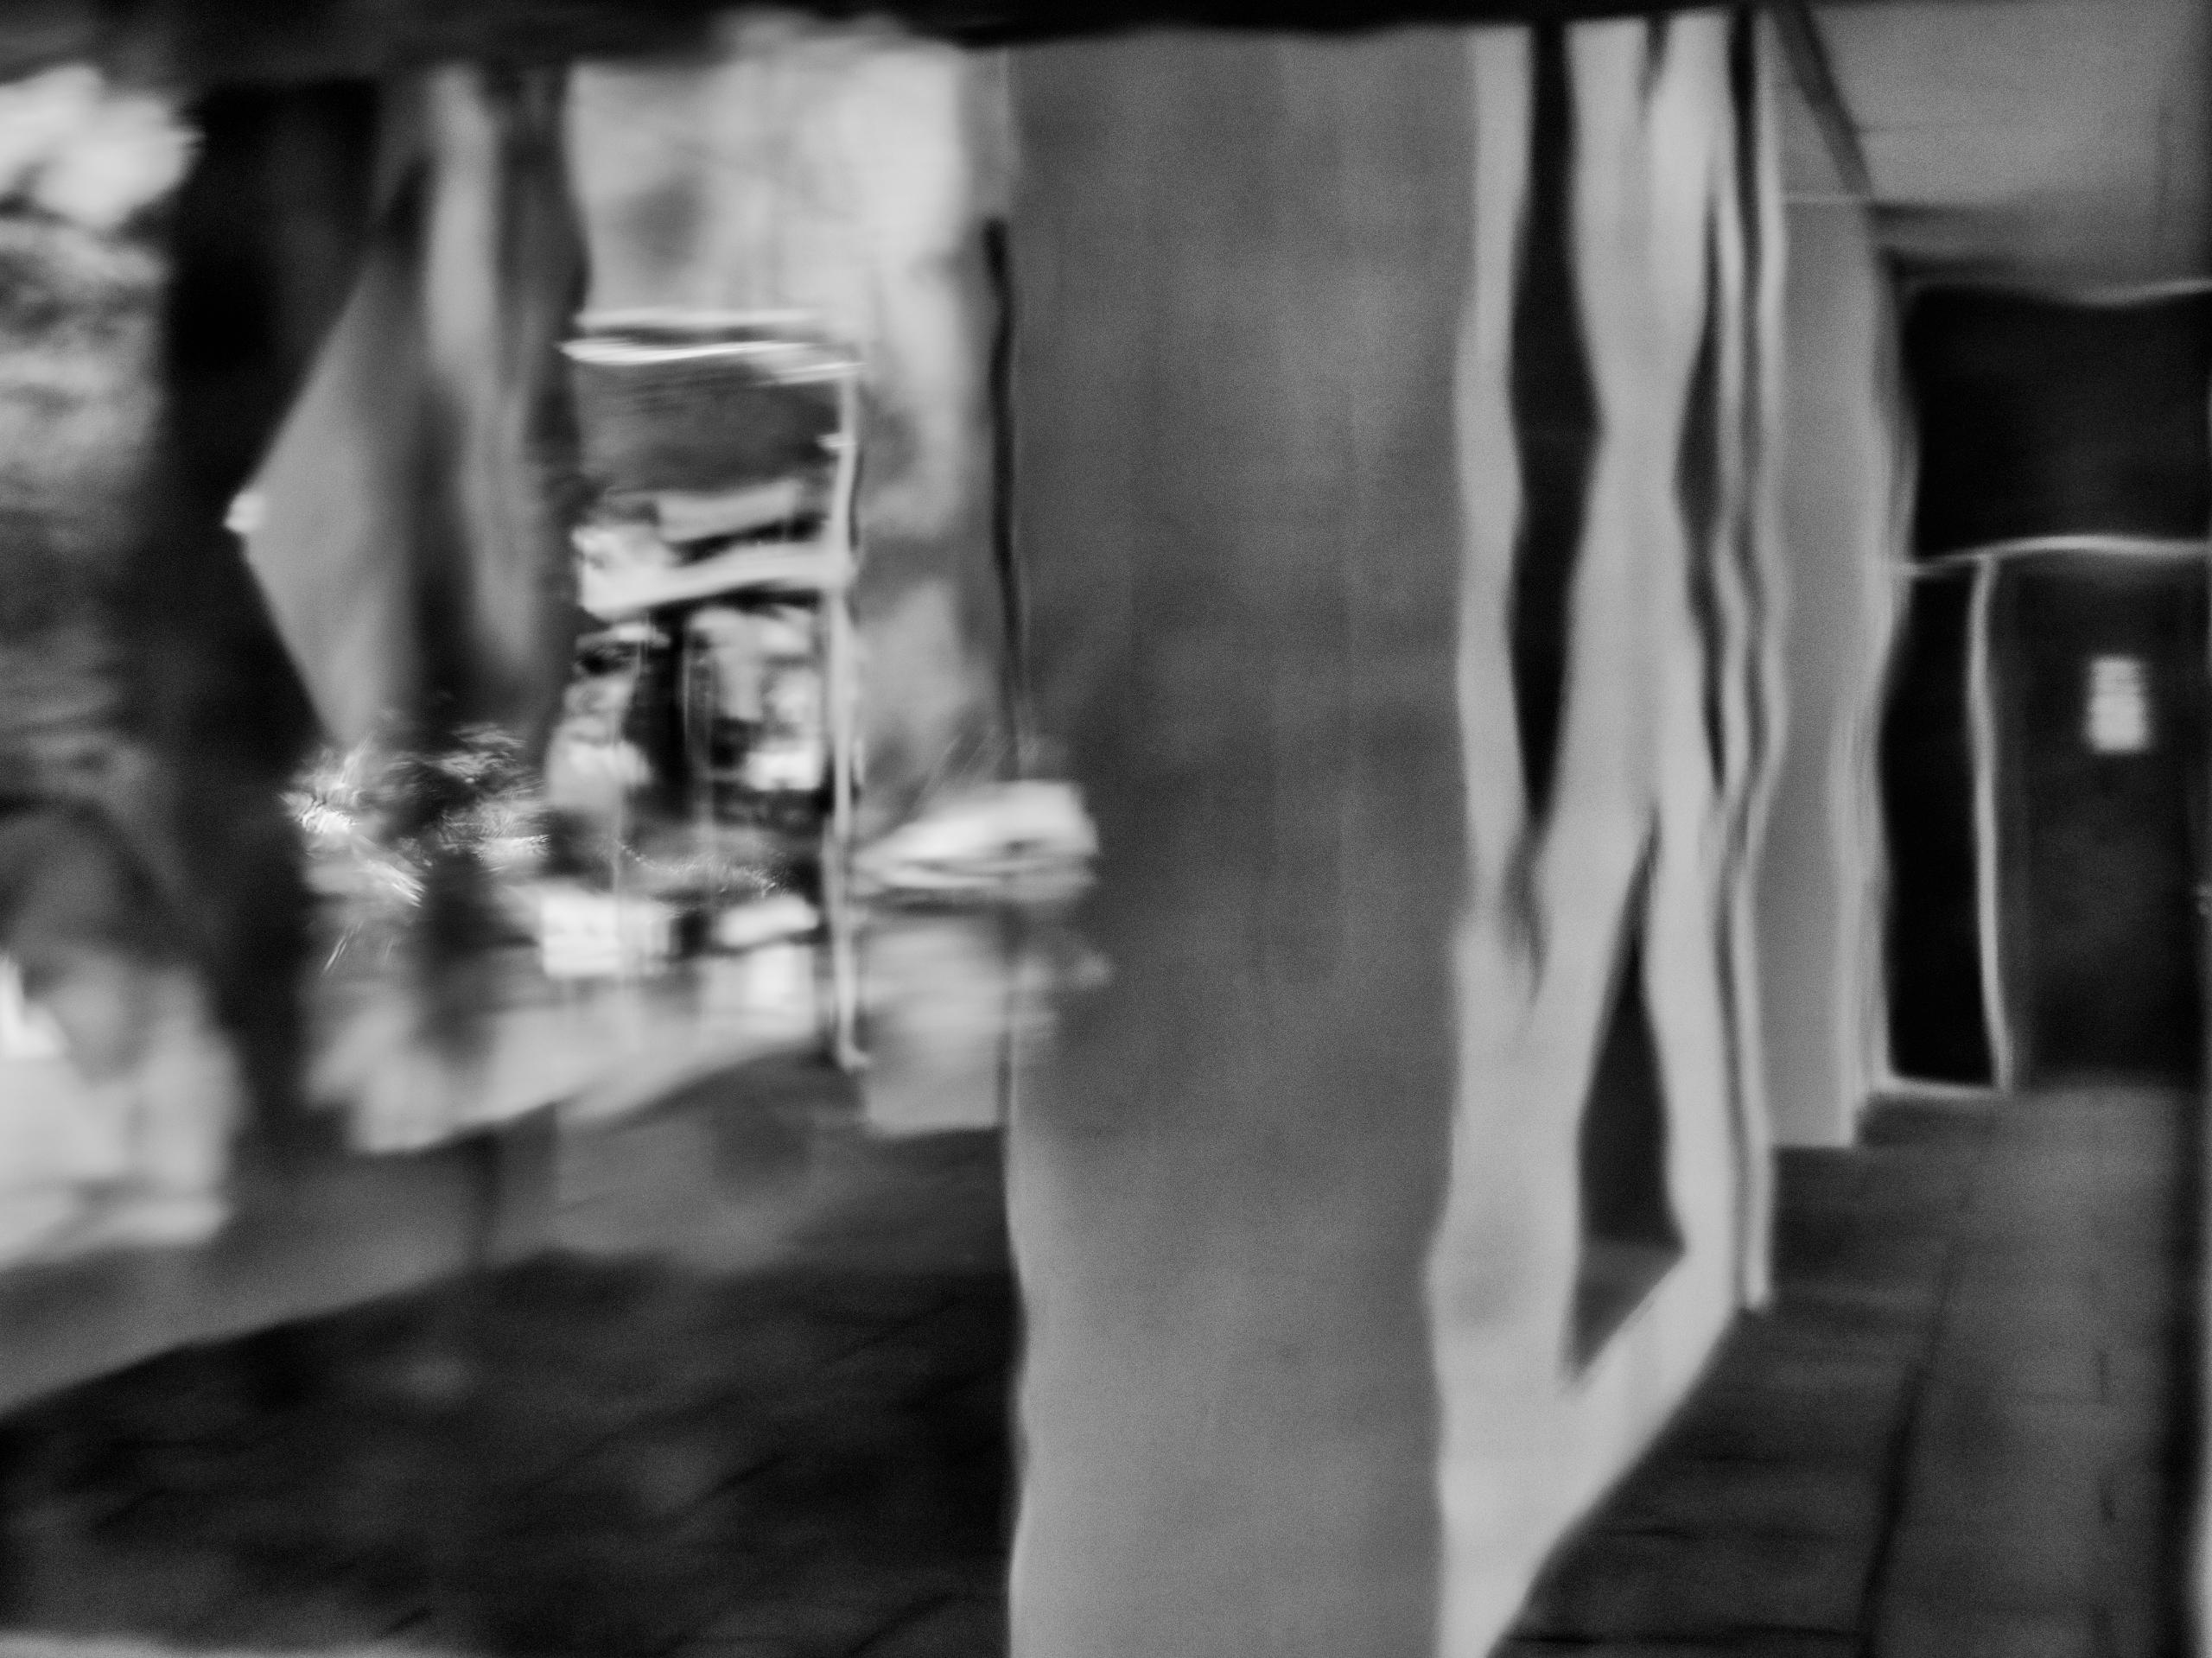 Glass Distortion images - blackandwhitephotography - hjsphoto | ello